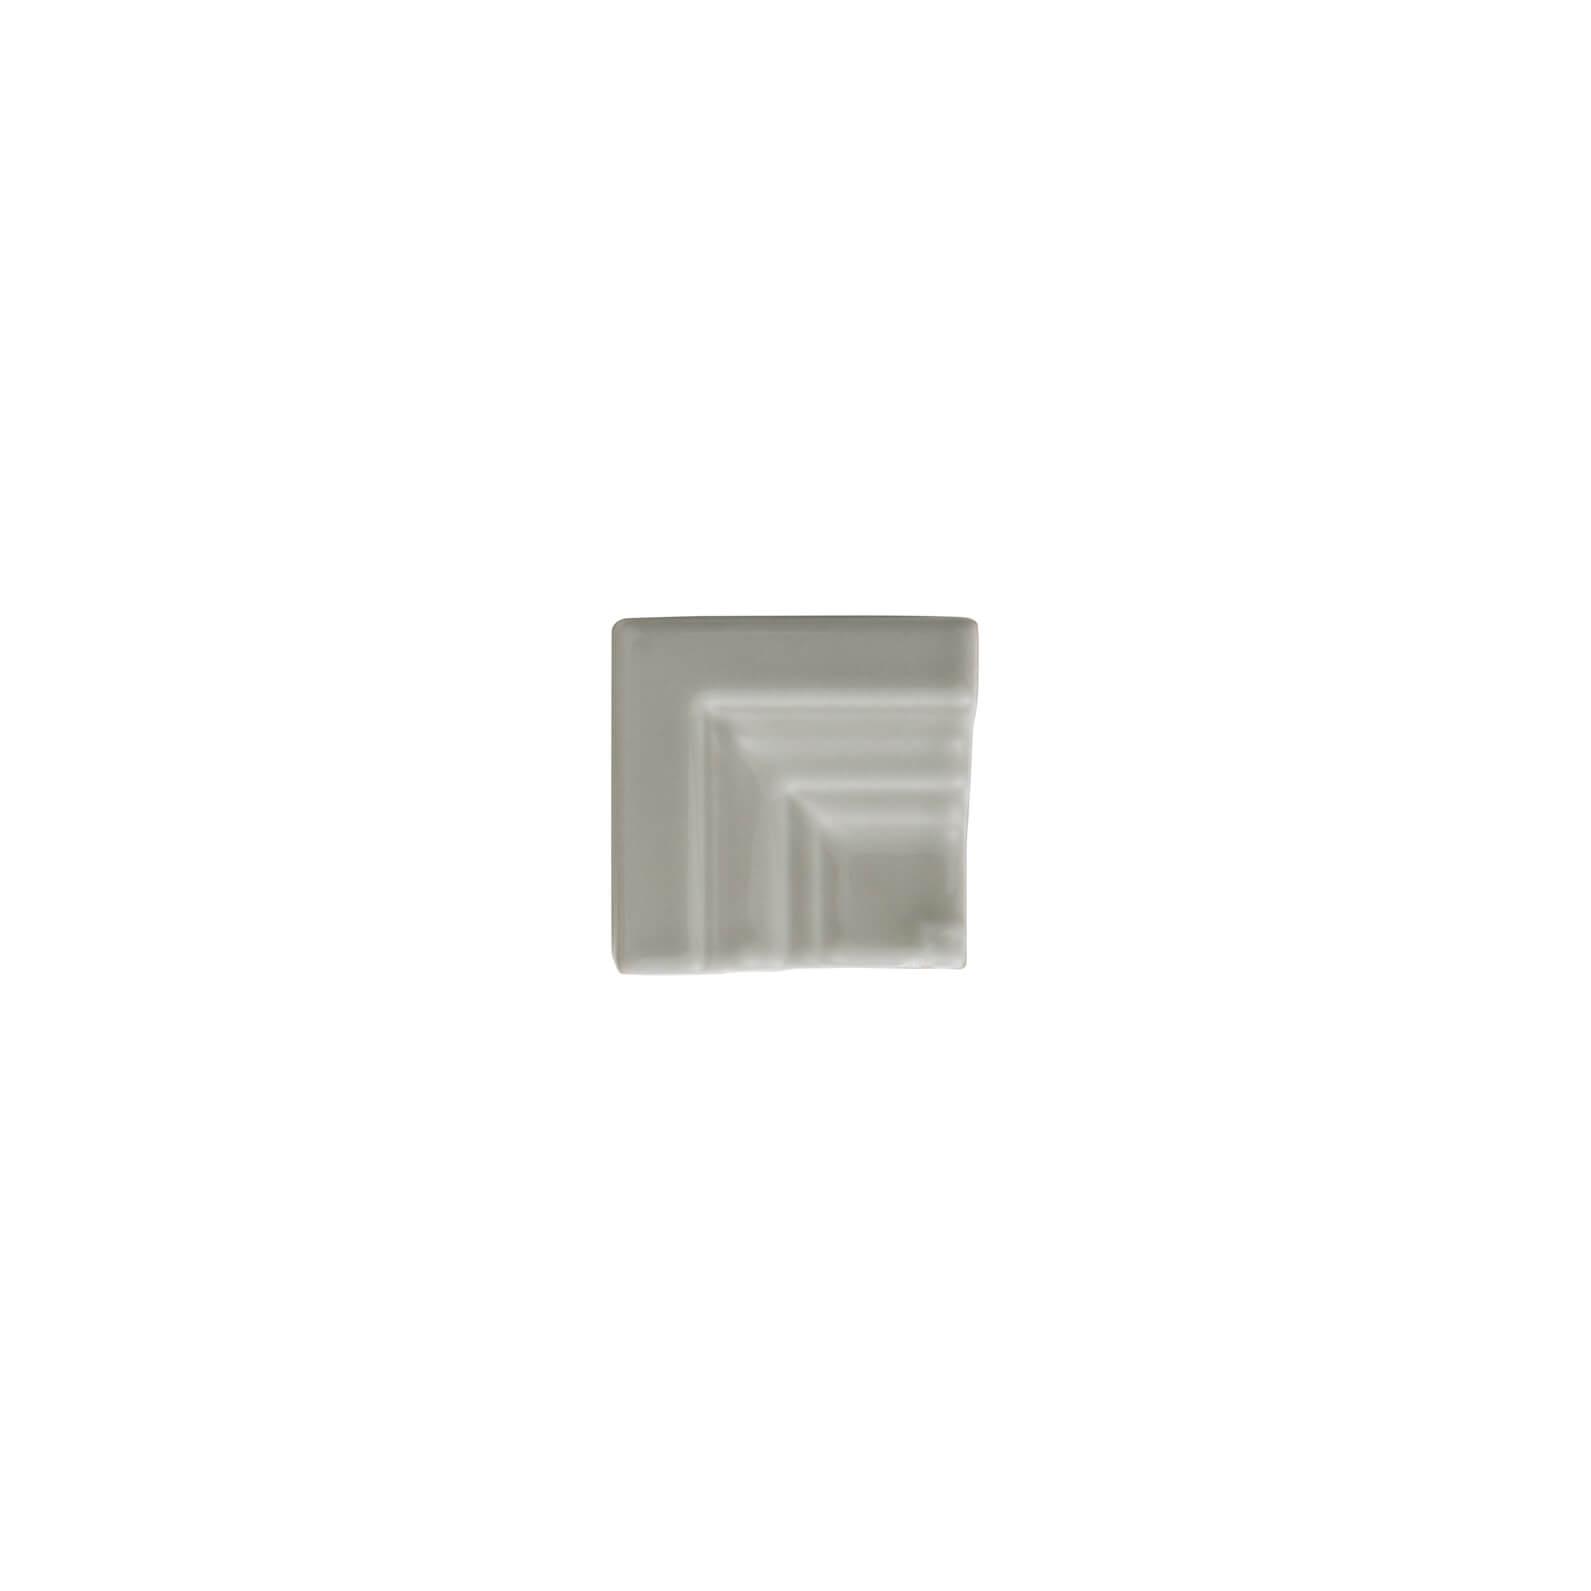 ADST5299 - ANGULO MARCO CORNISA - 5 cm X 19.8 cm